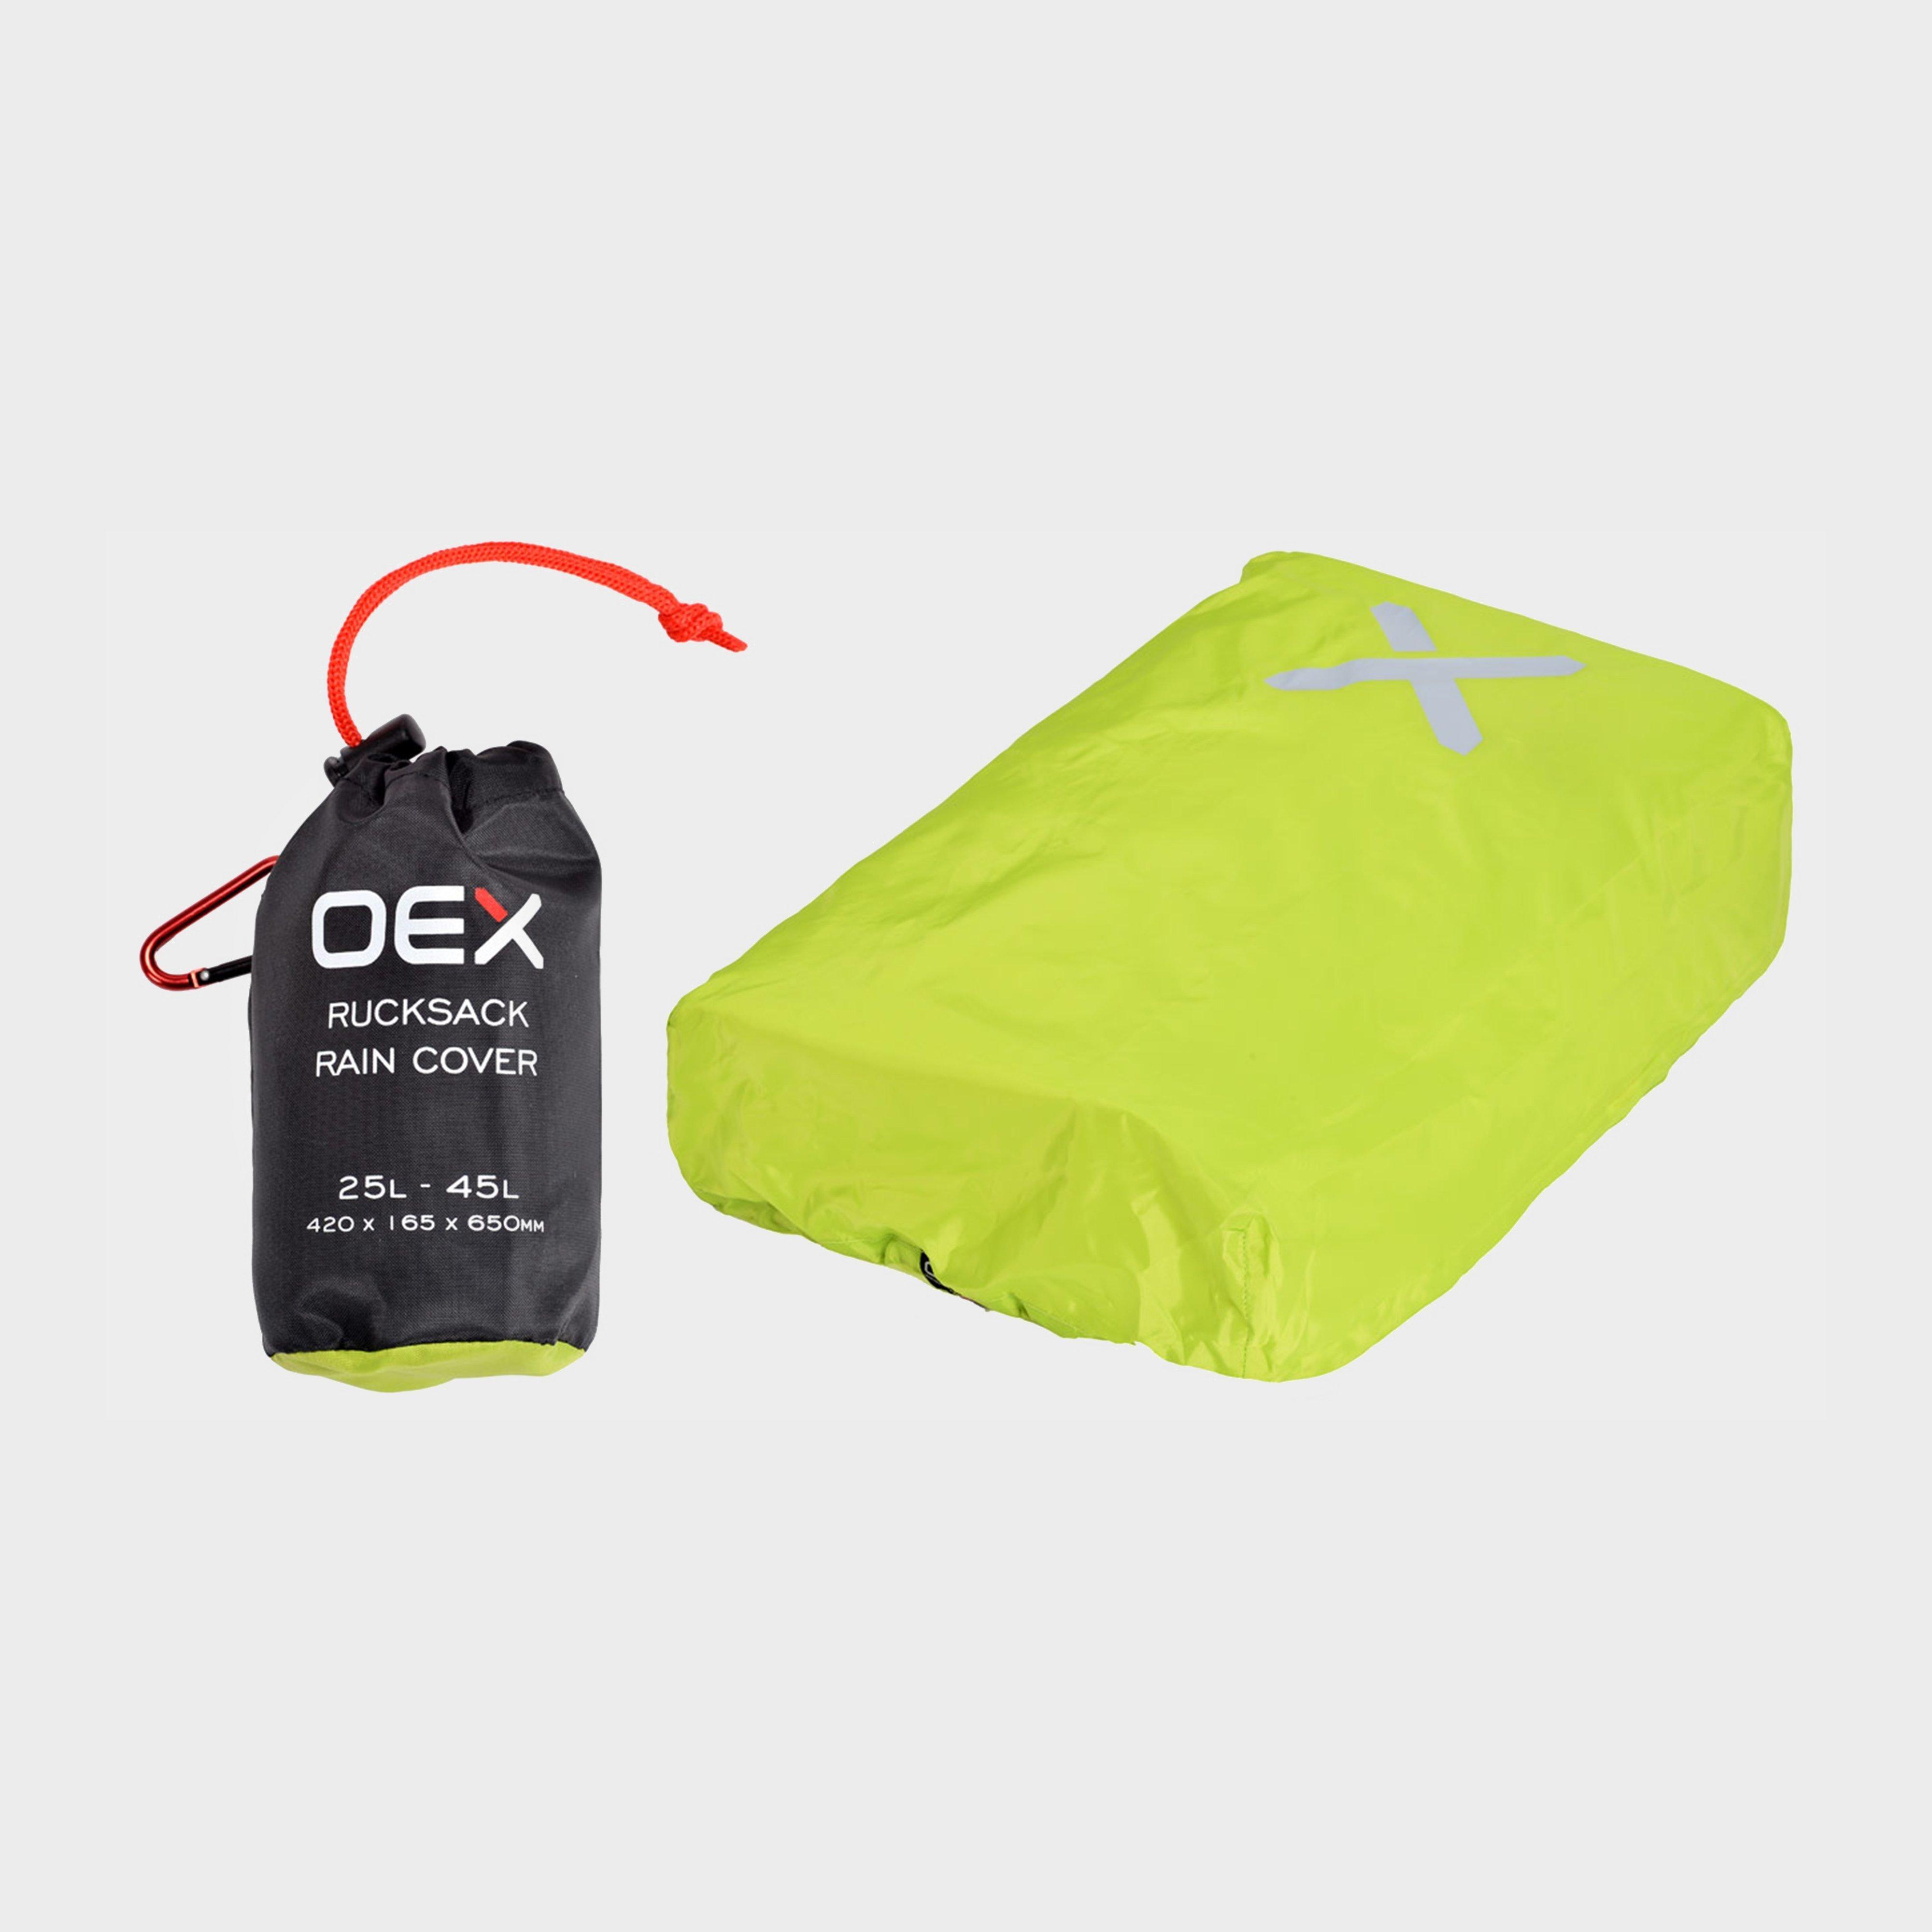 Oex Oex Rucksack Raincover (25L - 45L), Lime